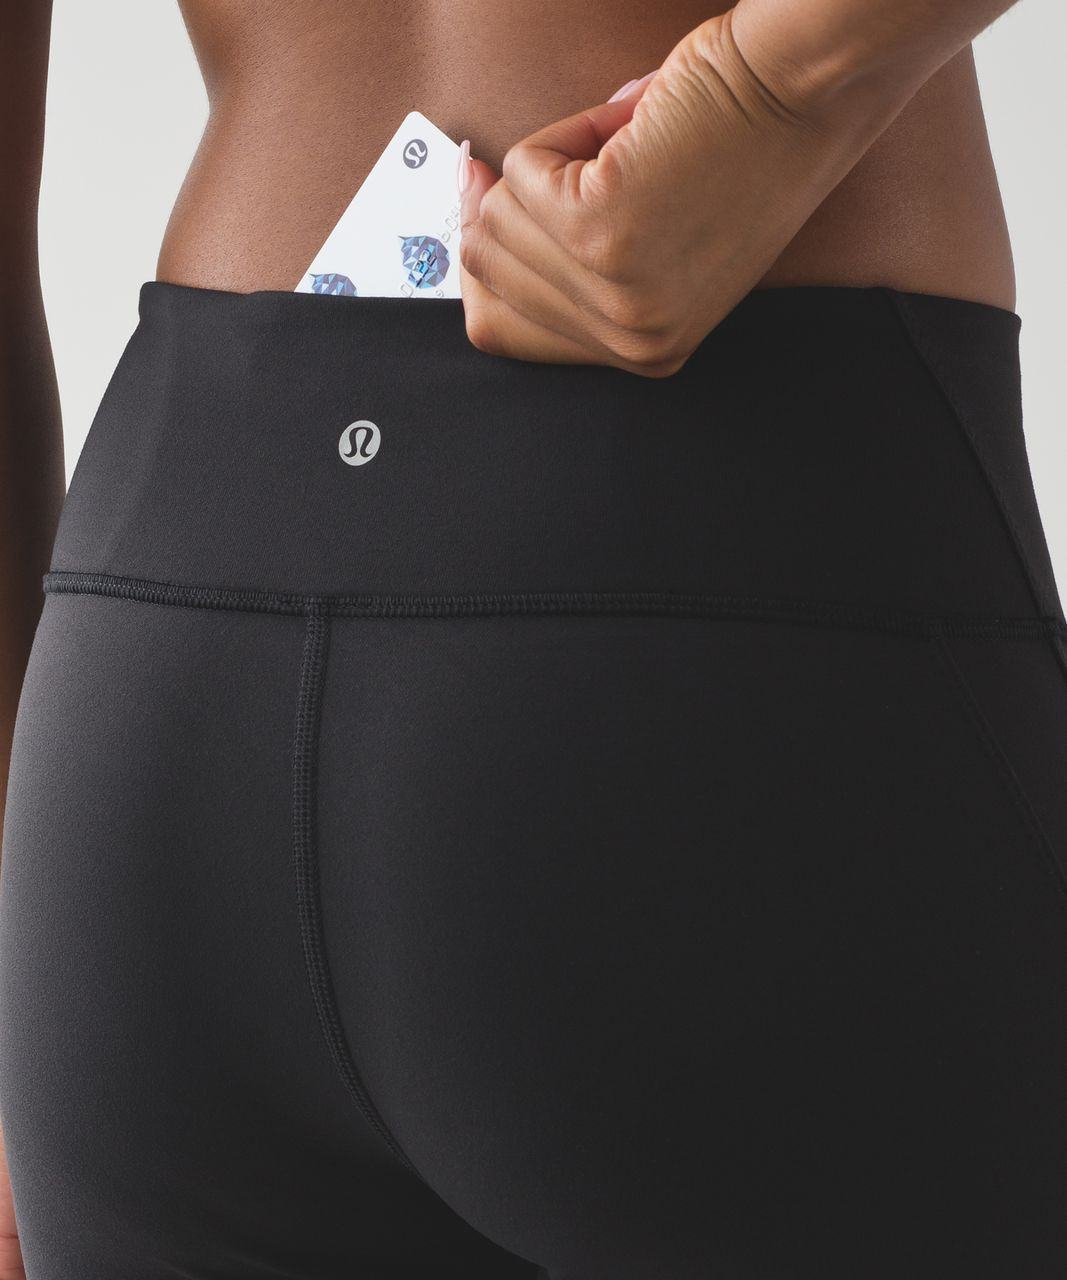 Lululemon Essential Rhythm Pant - Black